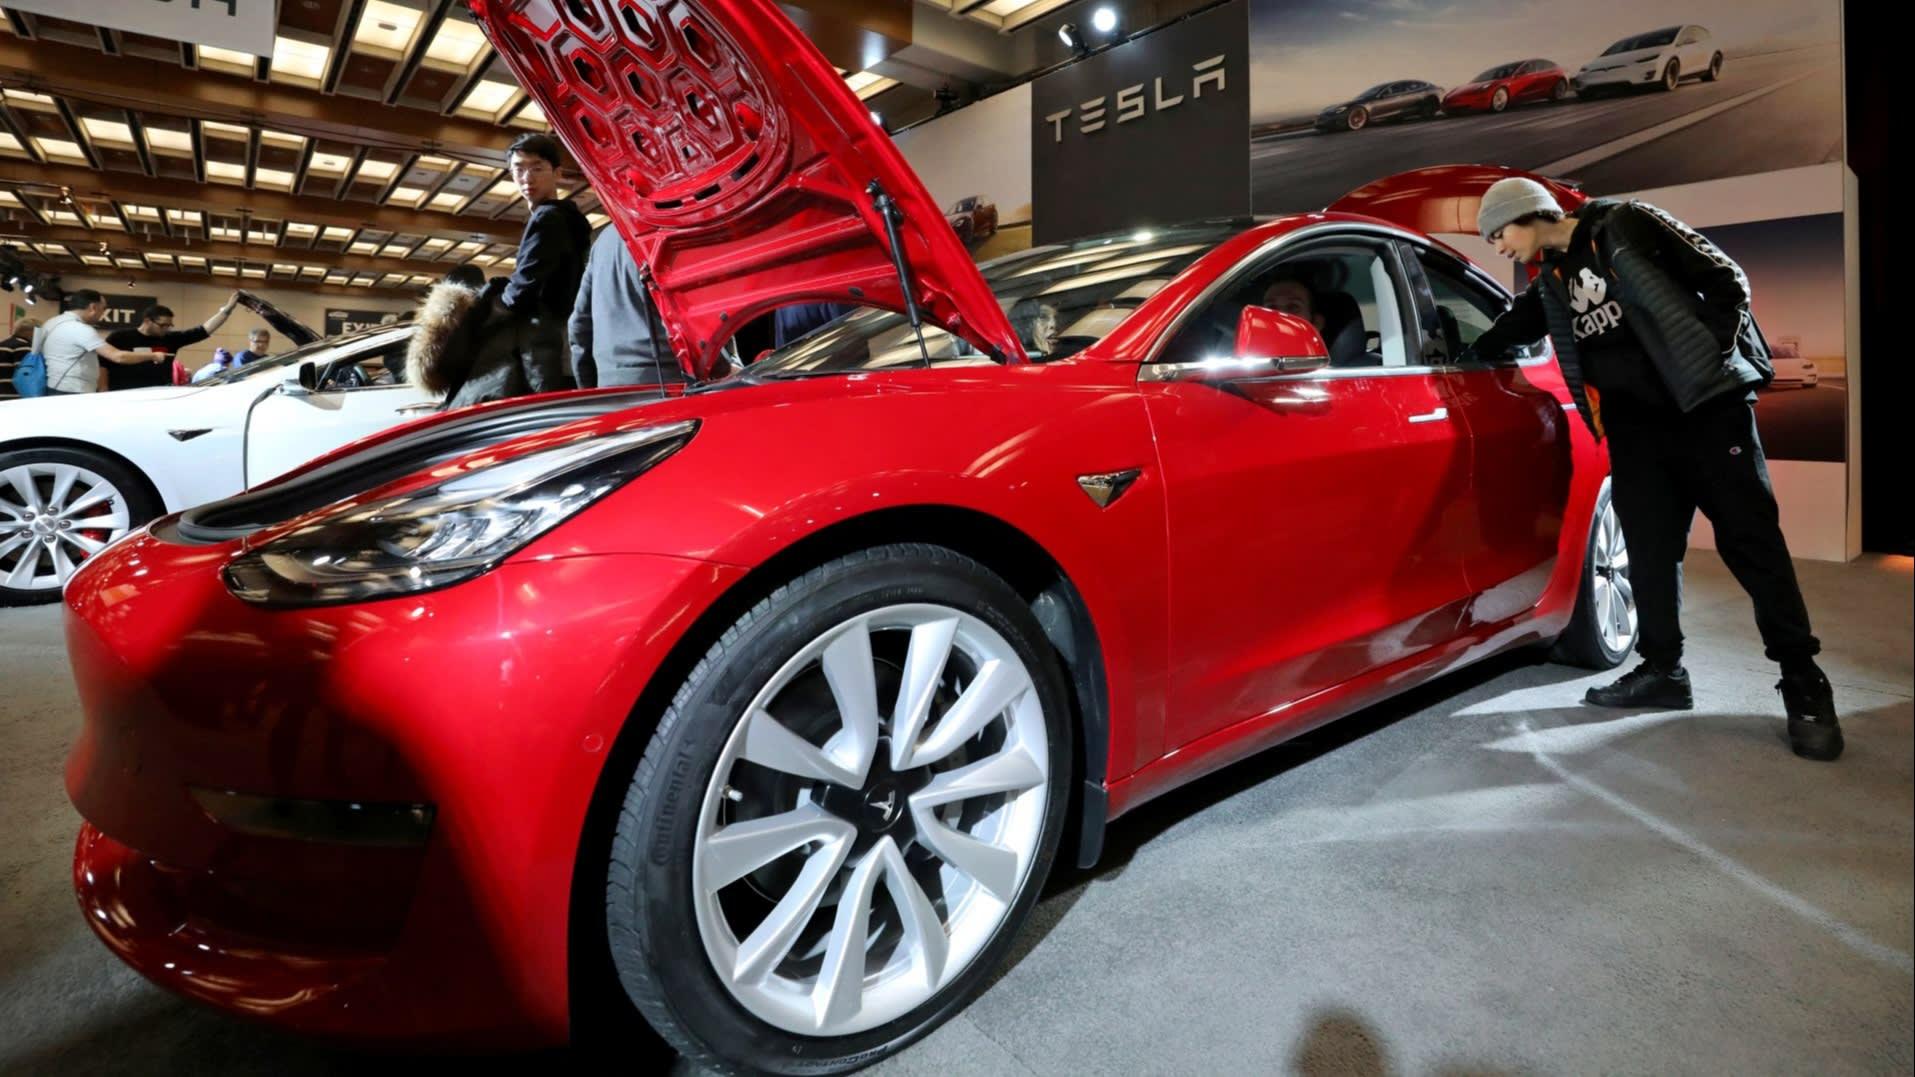 Tesla and Panasonic reopen talks on Gigafactory investment ...